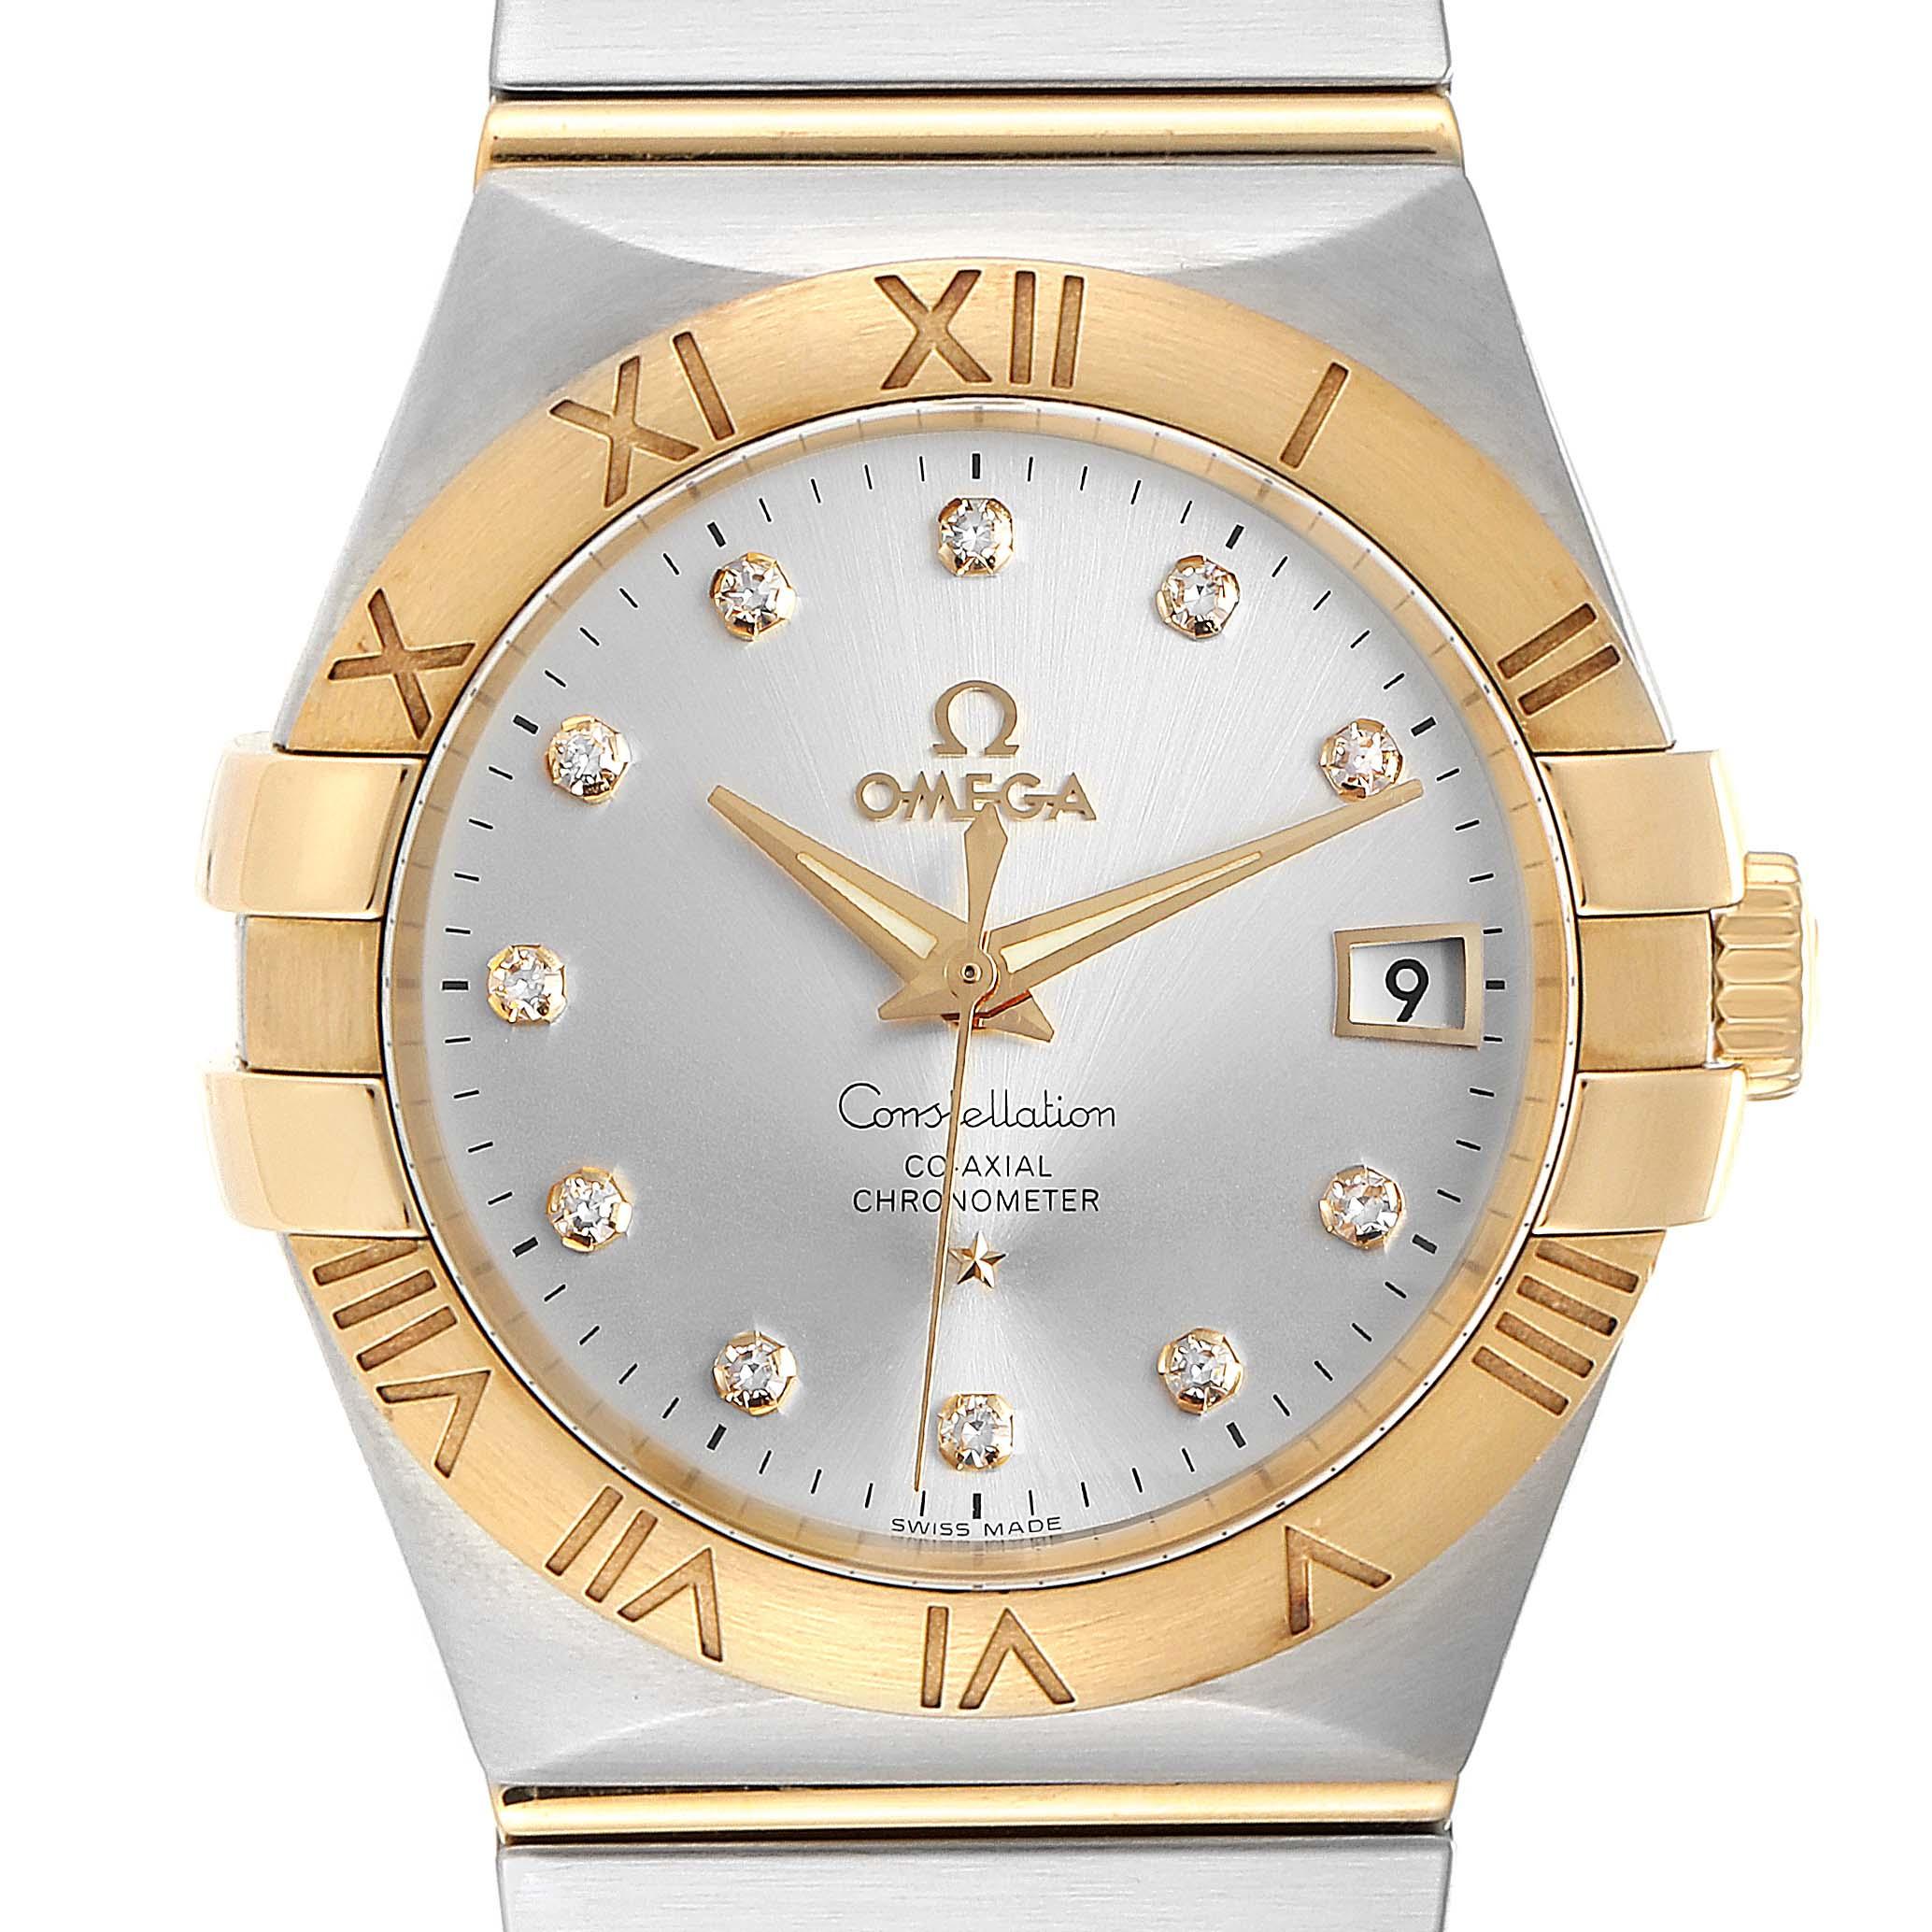 Photo of Omega Constellation Steel Yellow Gold Diamond Mens Watch 111.20.36.20.52.001